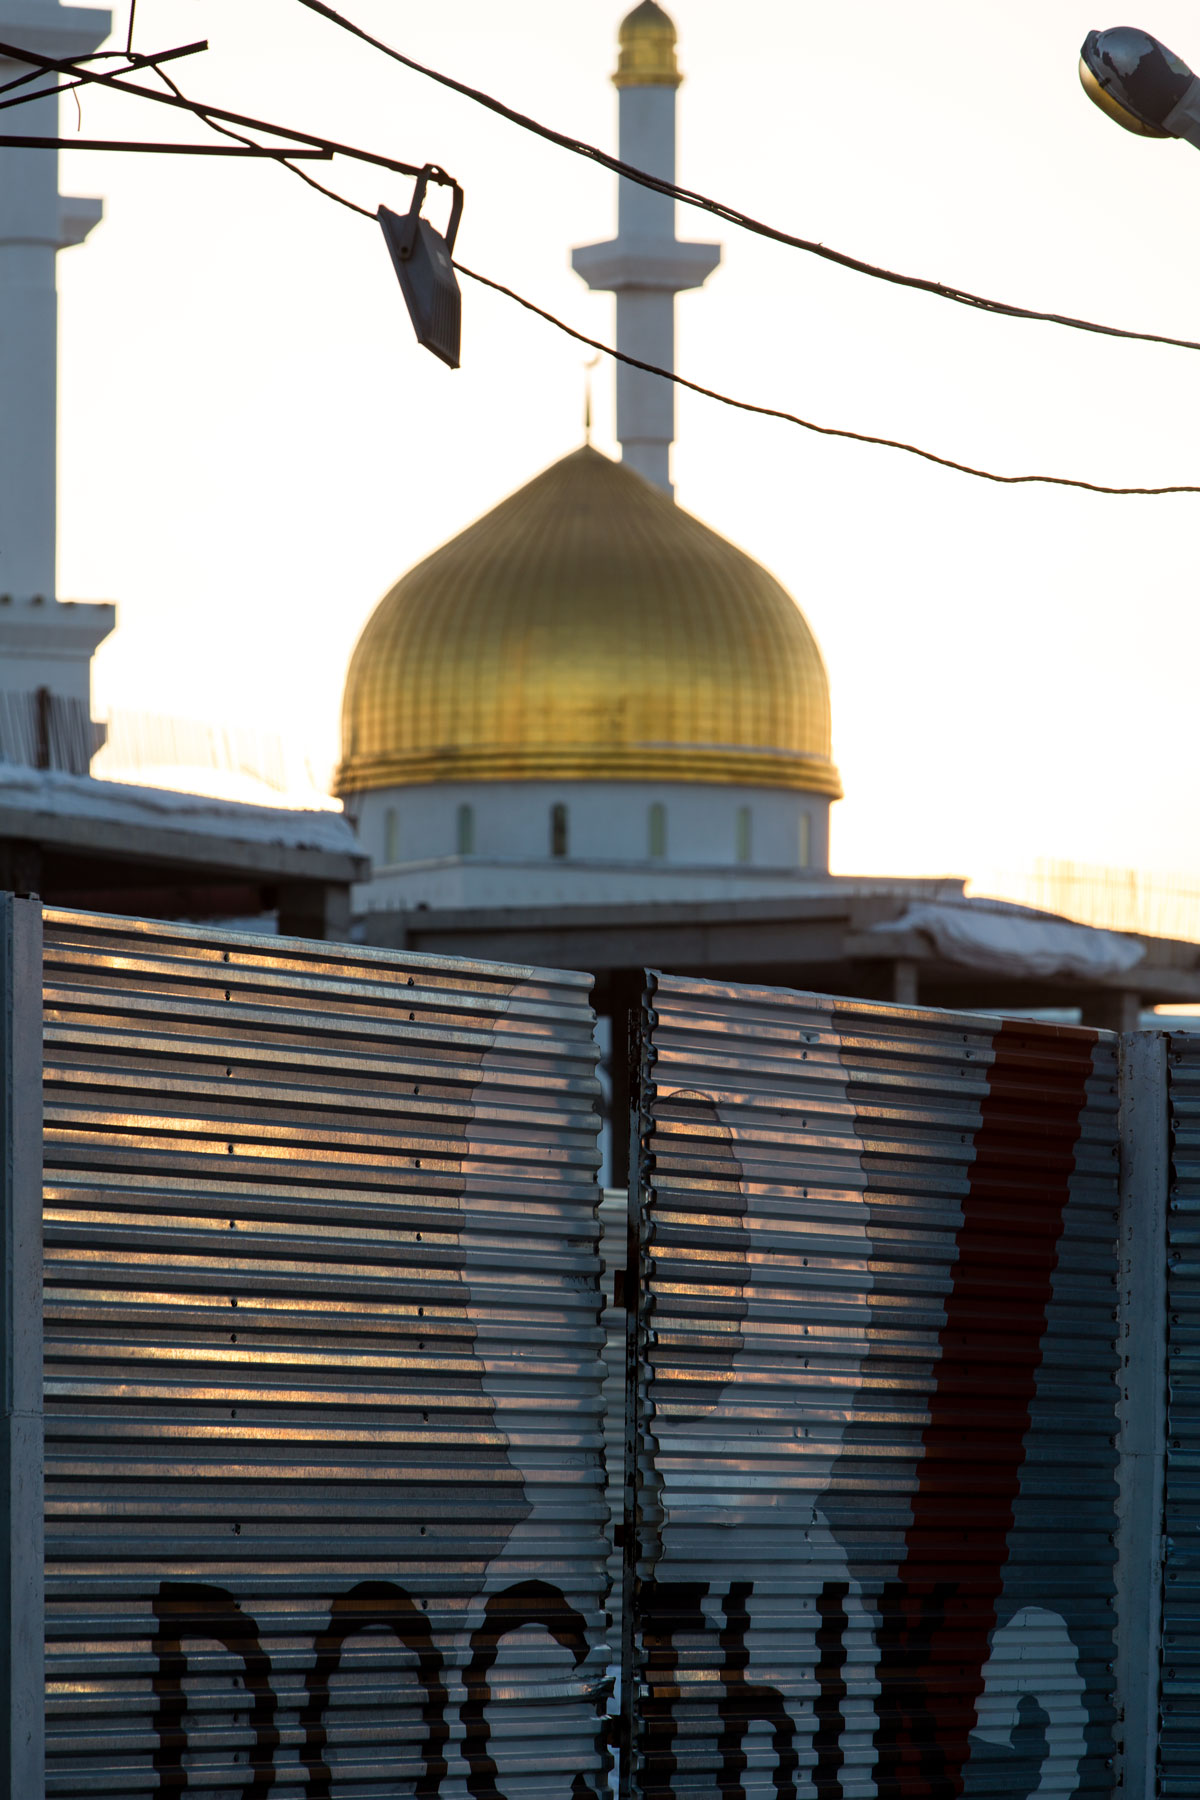 MosqueLight.jpg